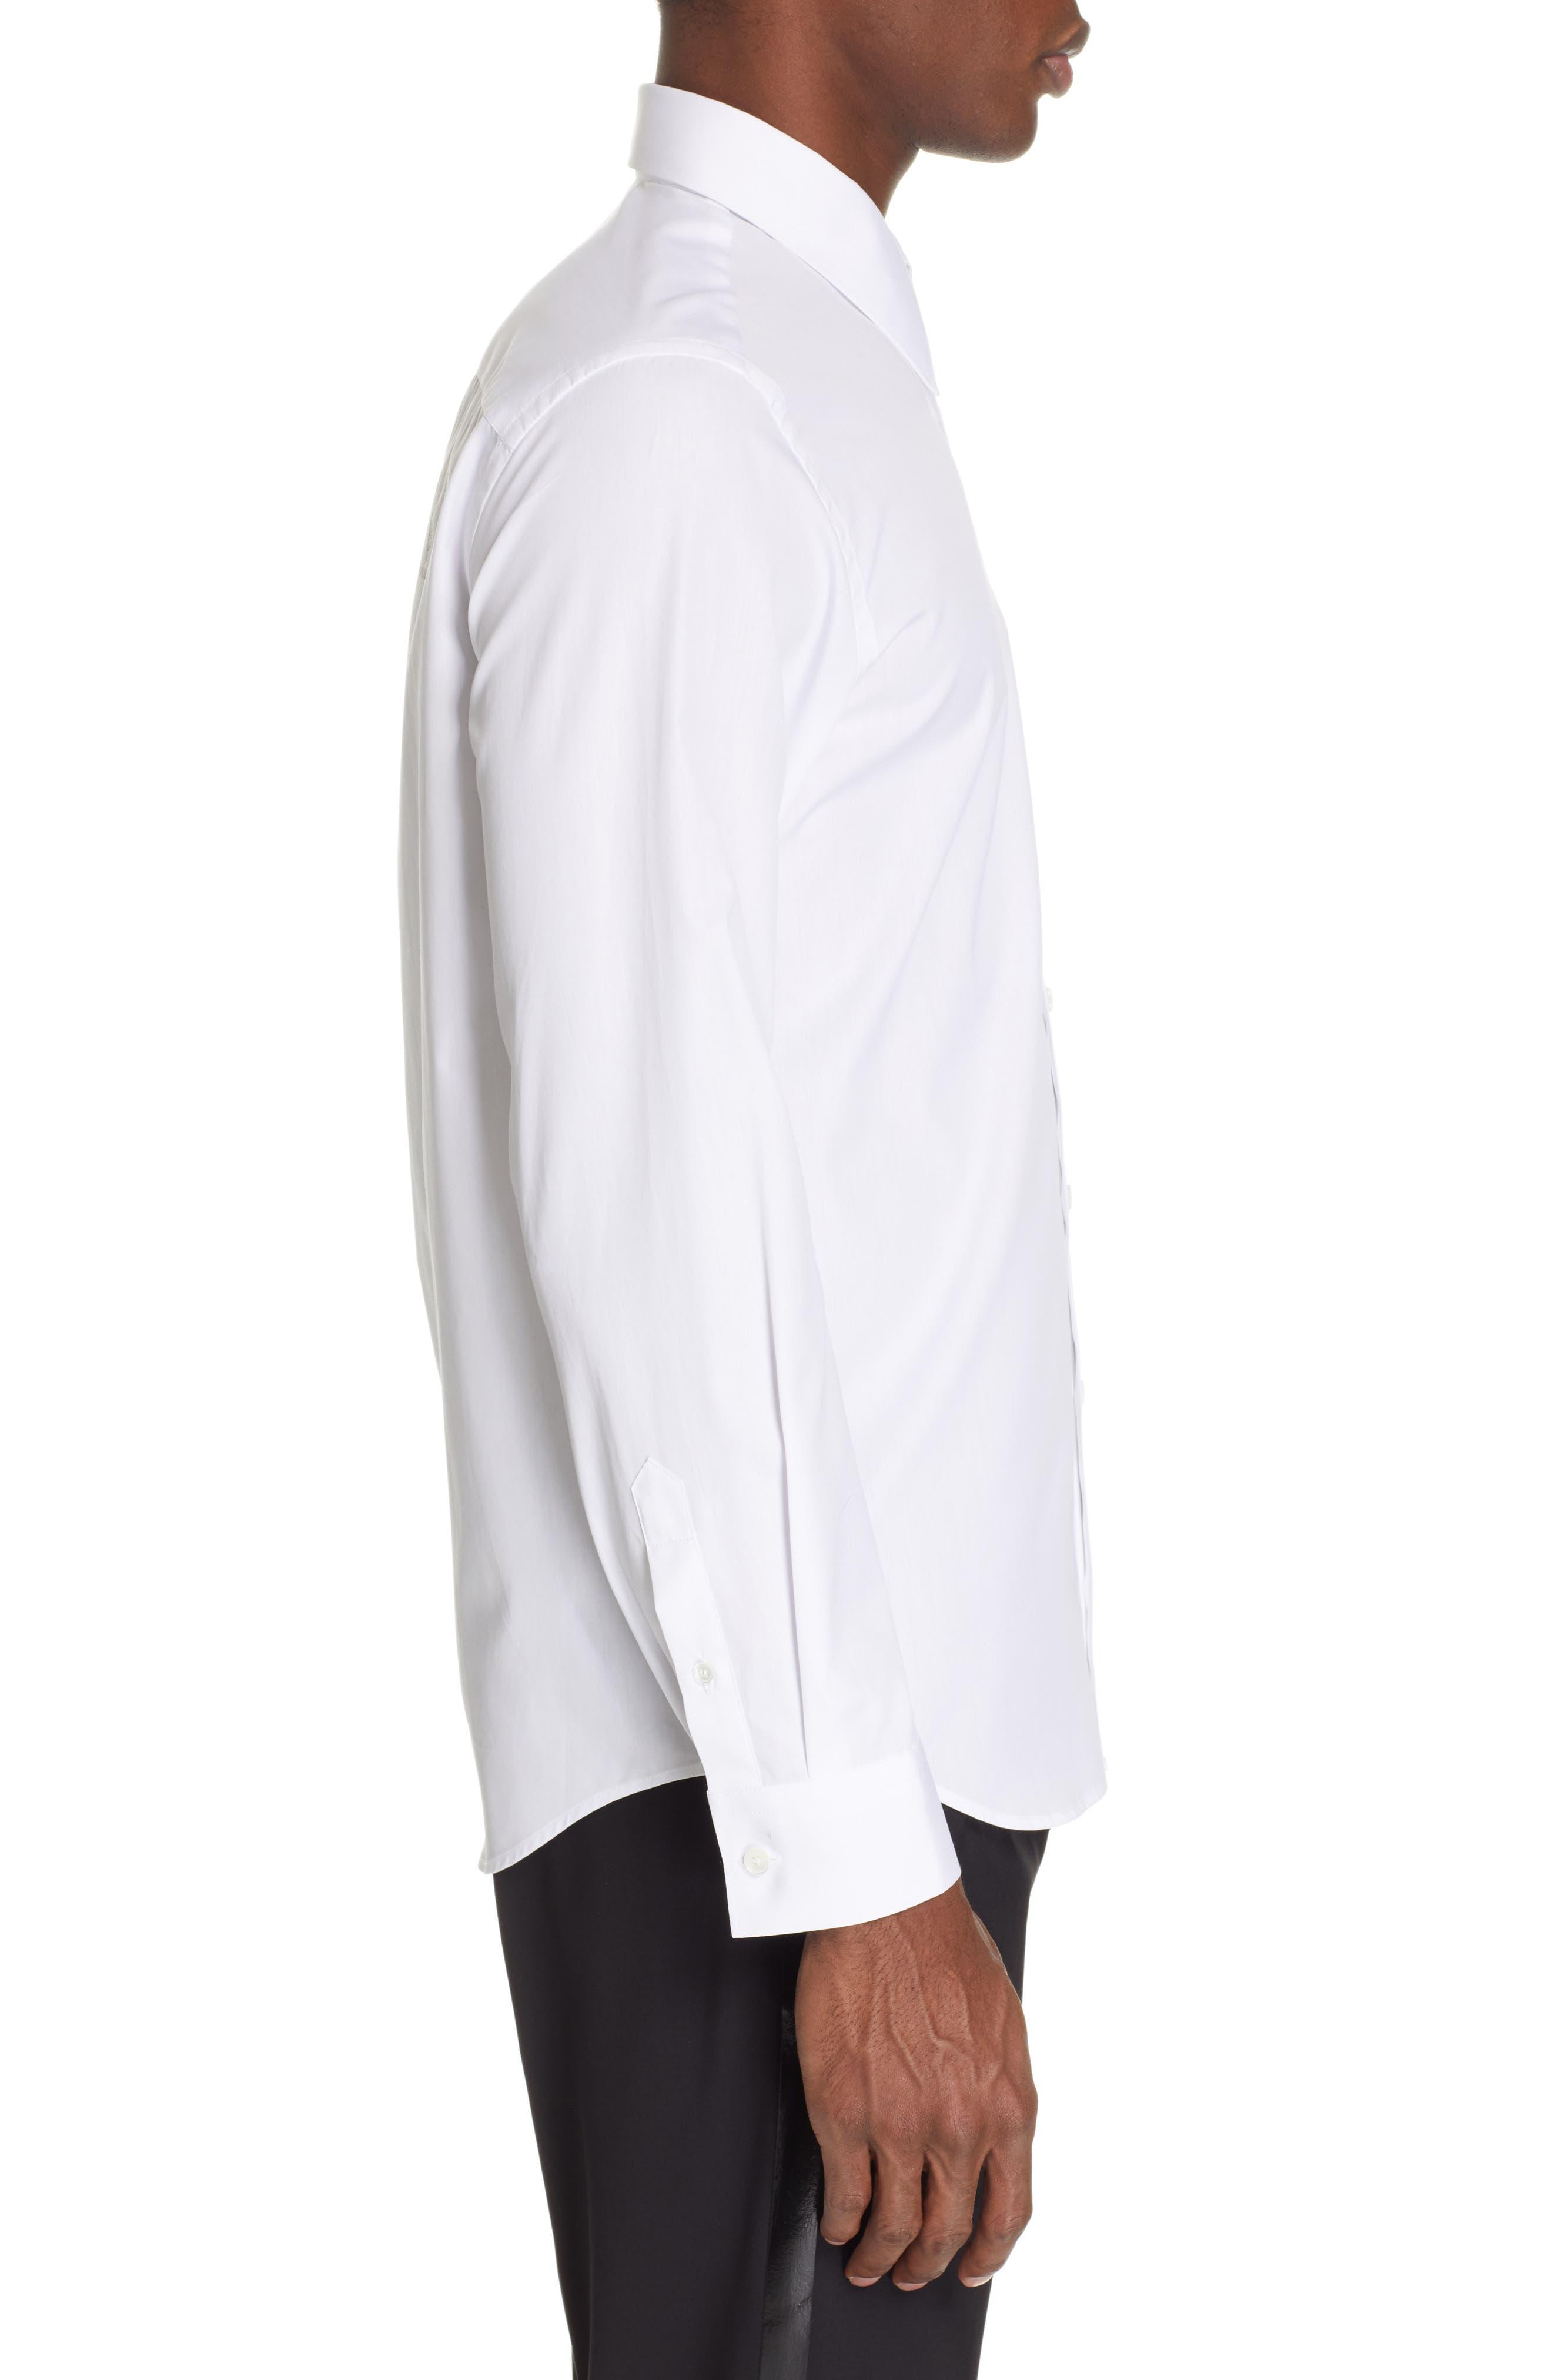 HELMUT LANG, Logo Back Long Sleeve Woven Shirt, Alternate thumbnail 4, color, WHITE AND BLACK